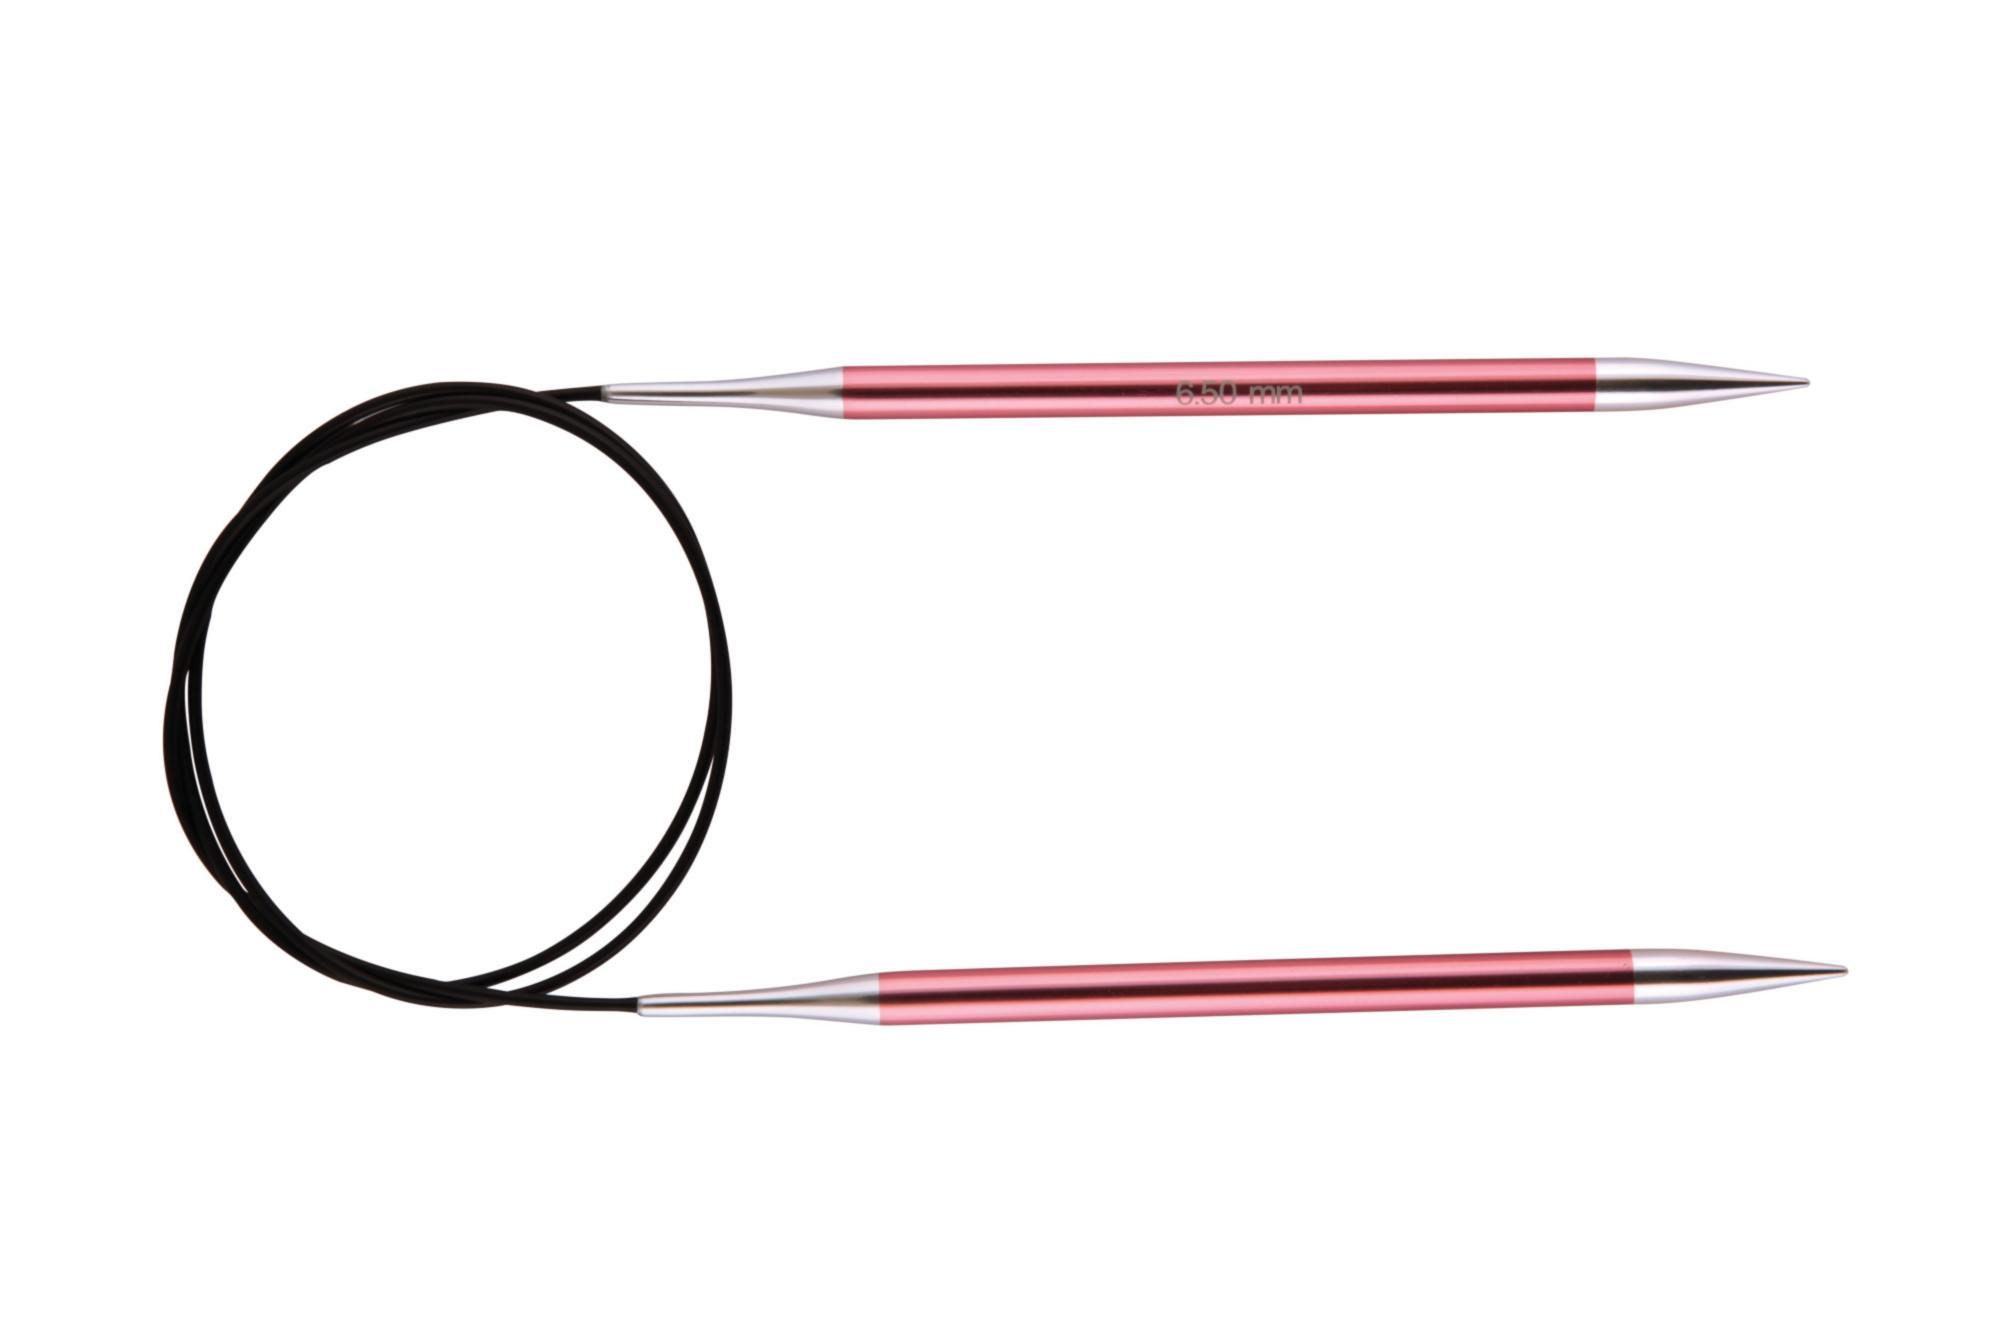 Спицы круговые 40 см Zing KnitPro, 47074, 6.50 мм